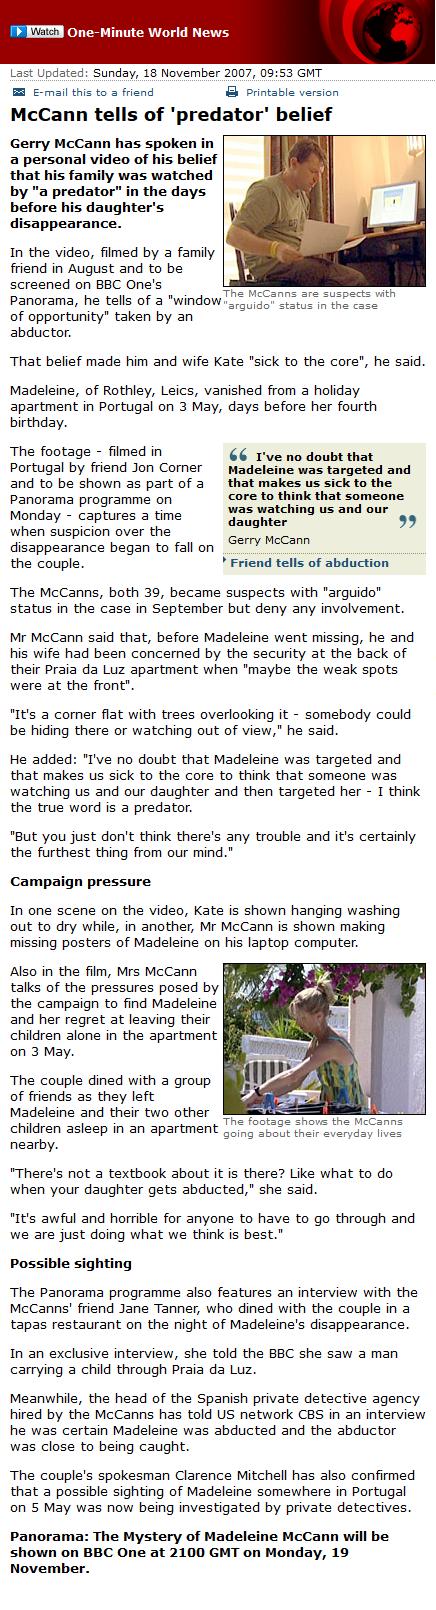 Media Mayhem - MCCANN MEDIA NONSENSE OF THE DAY - Page 31 Scree149